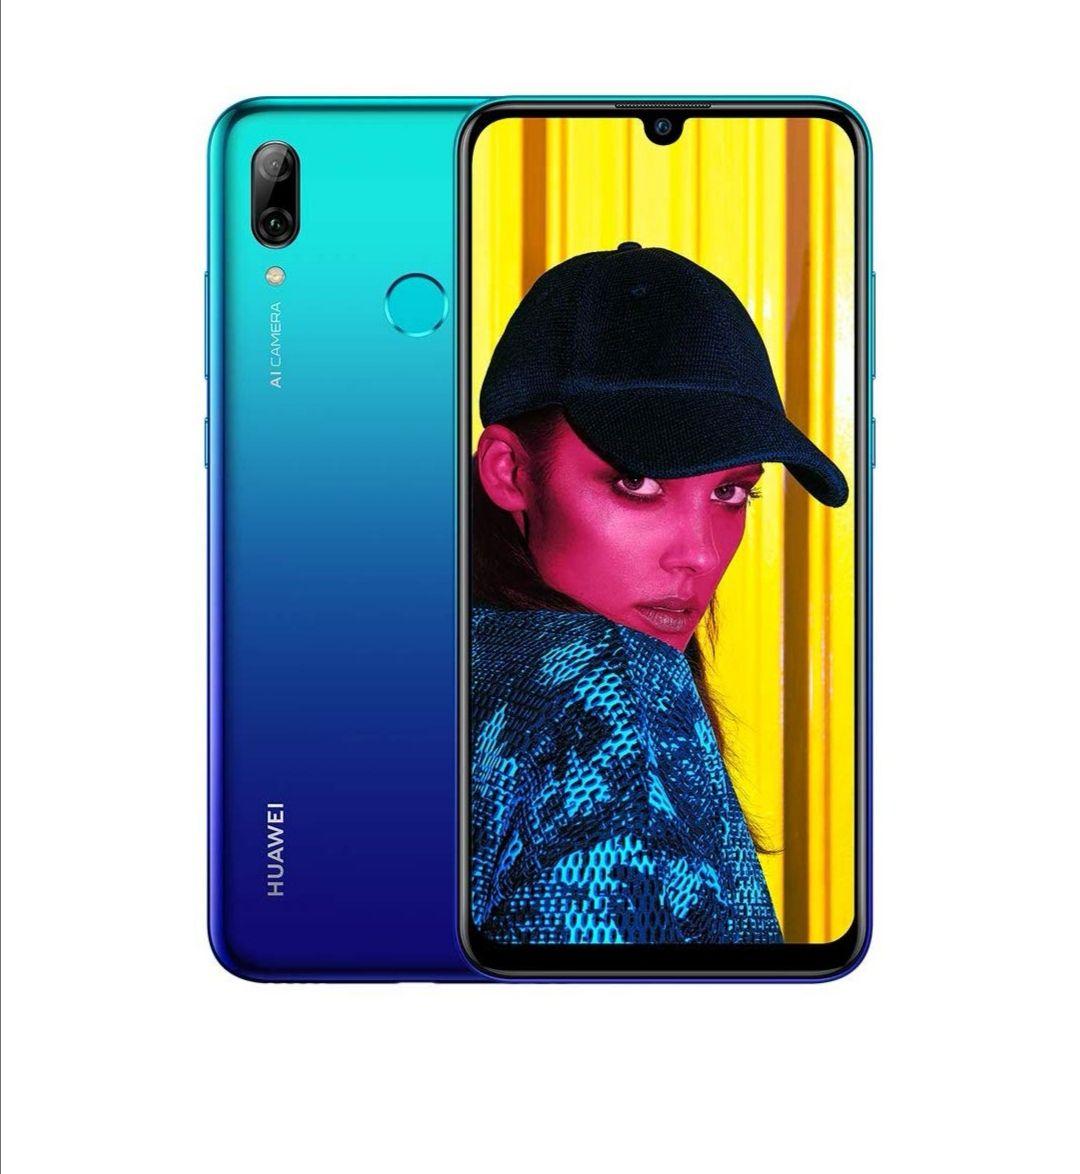 Huawei P Smart 2019 64GB/3GB Smartphone £149.95 @ Amazon